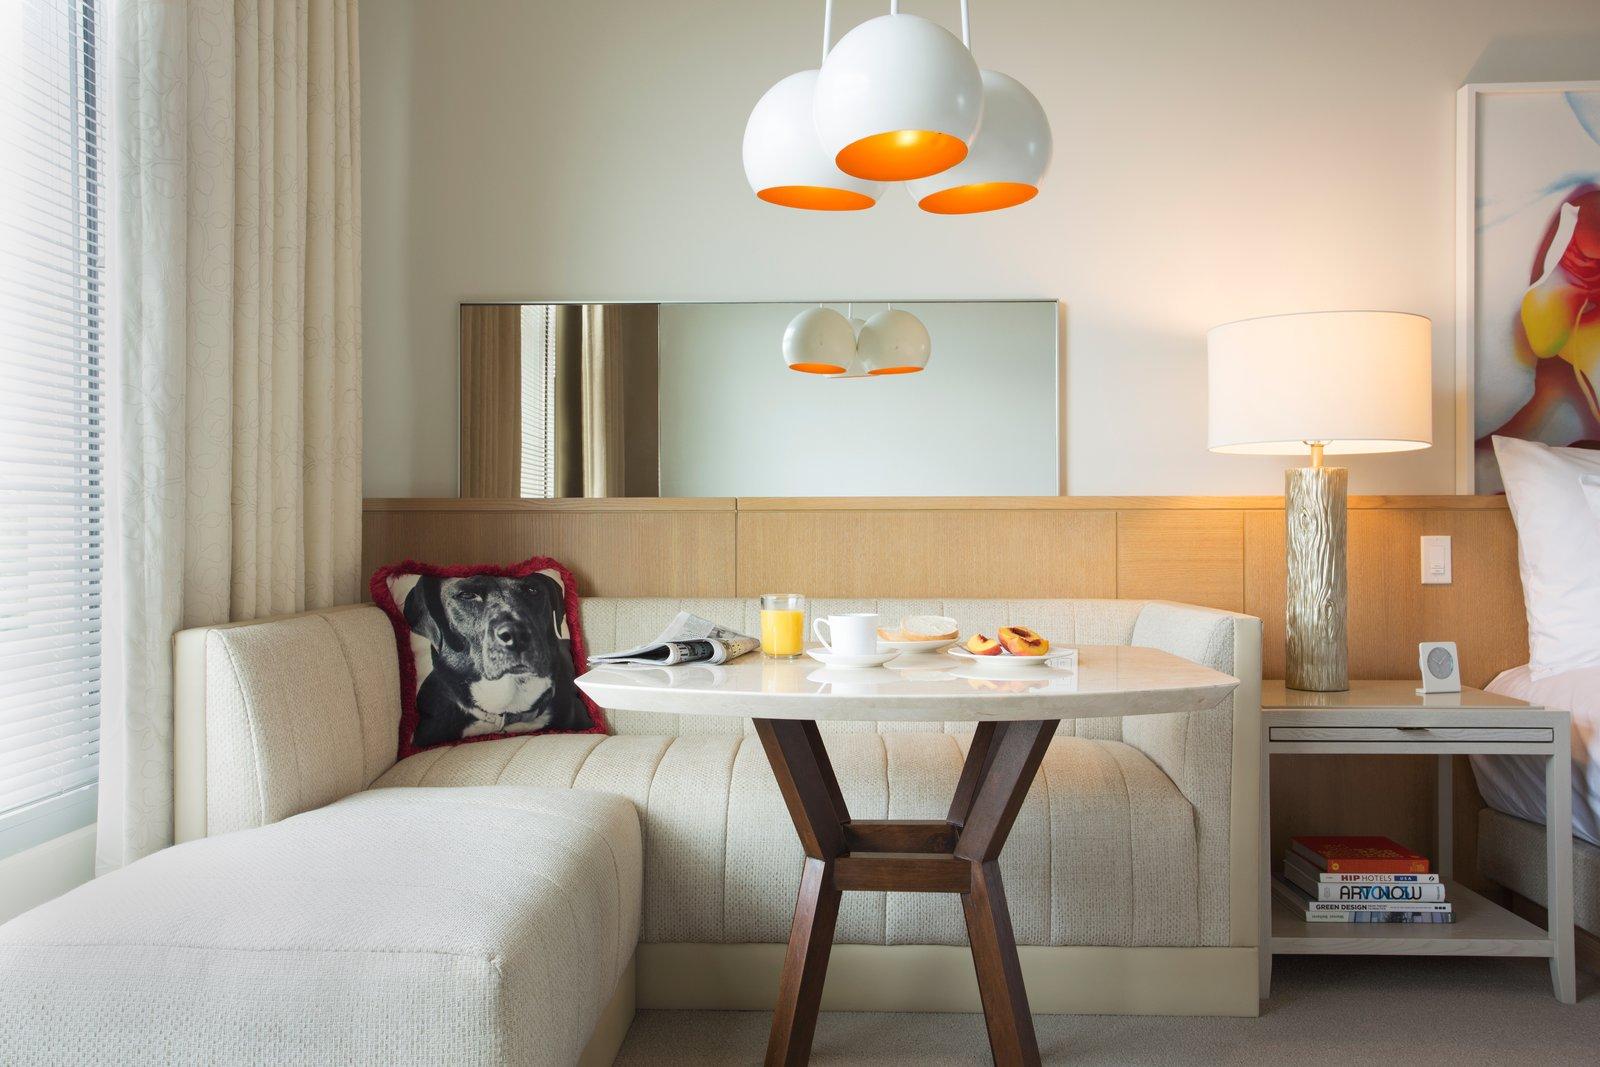 Modern Breakfast Nook Ideas 21C Museum Hotel Bentonville